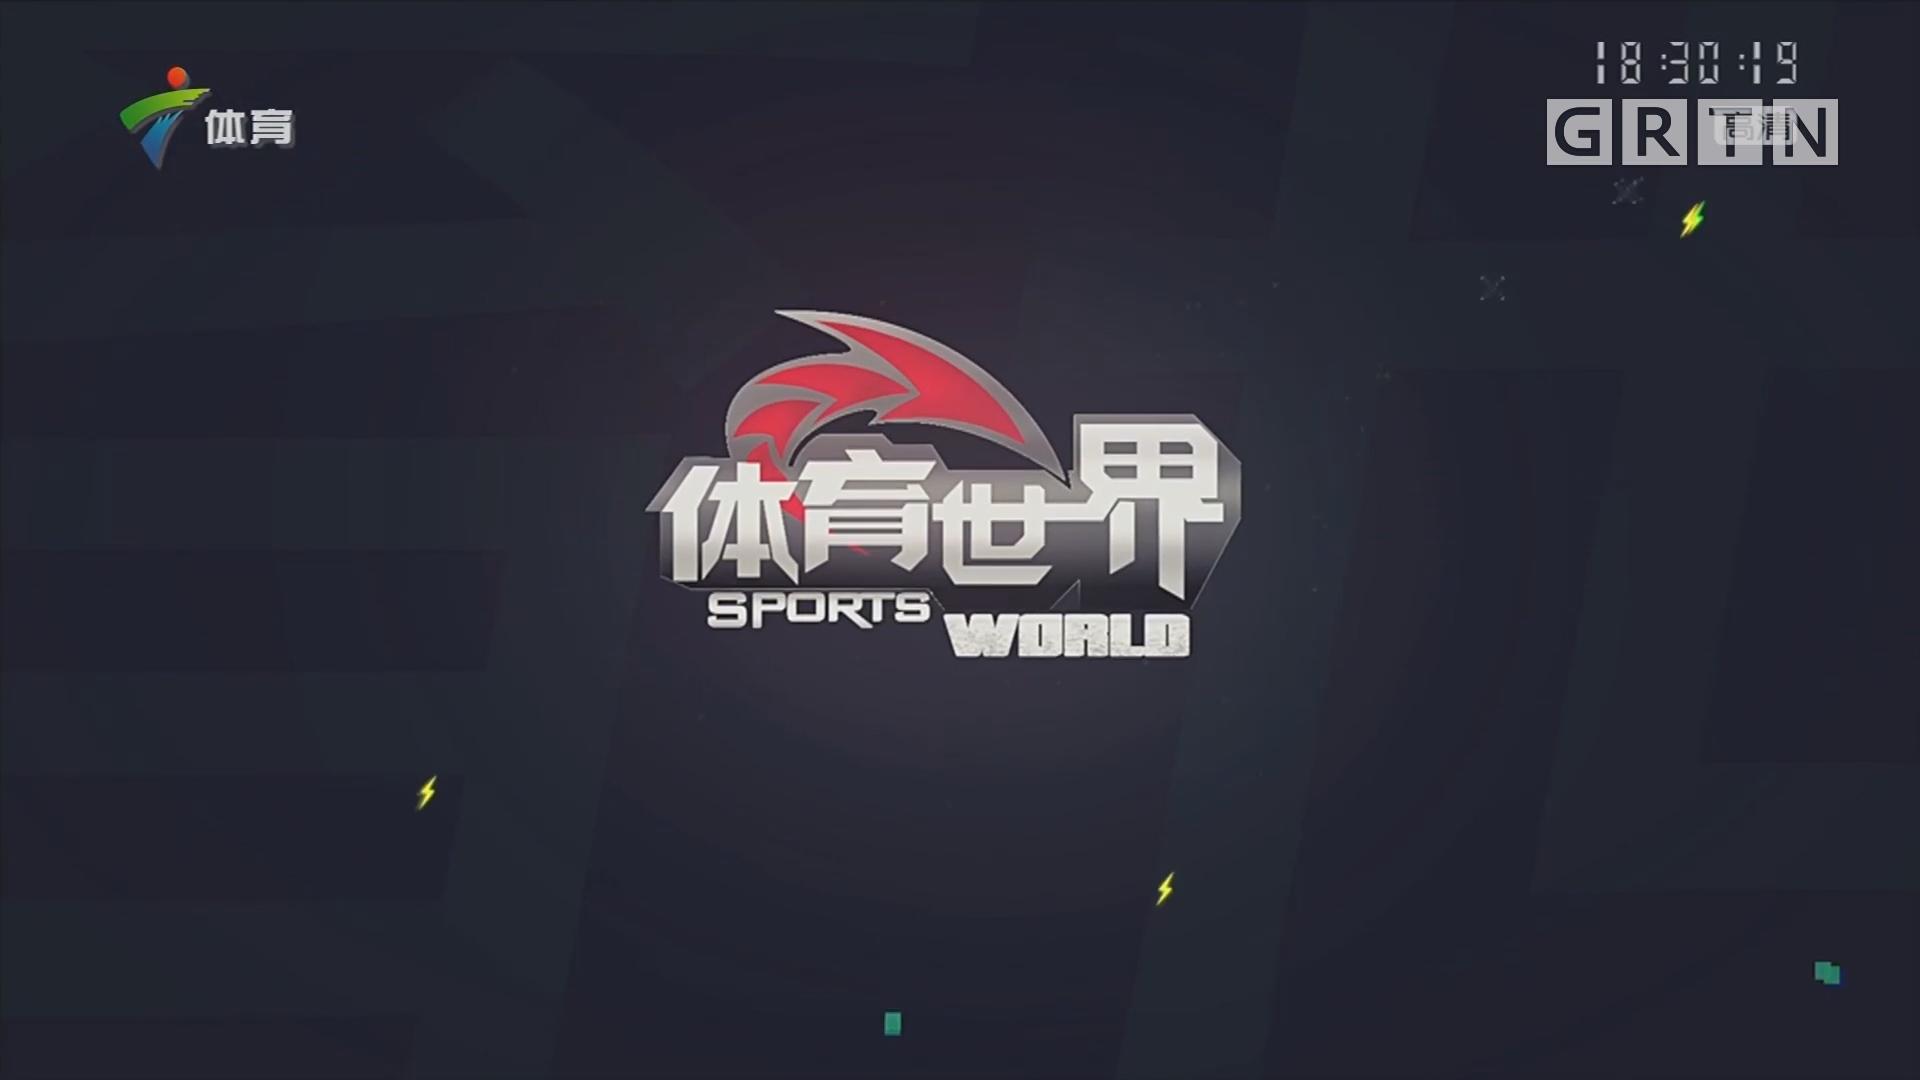 [HD][2018-07-19]体育世界:万里长江横渡 广东百人方阵极目楚天舒